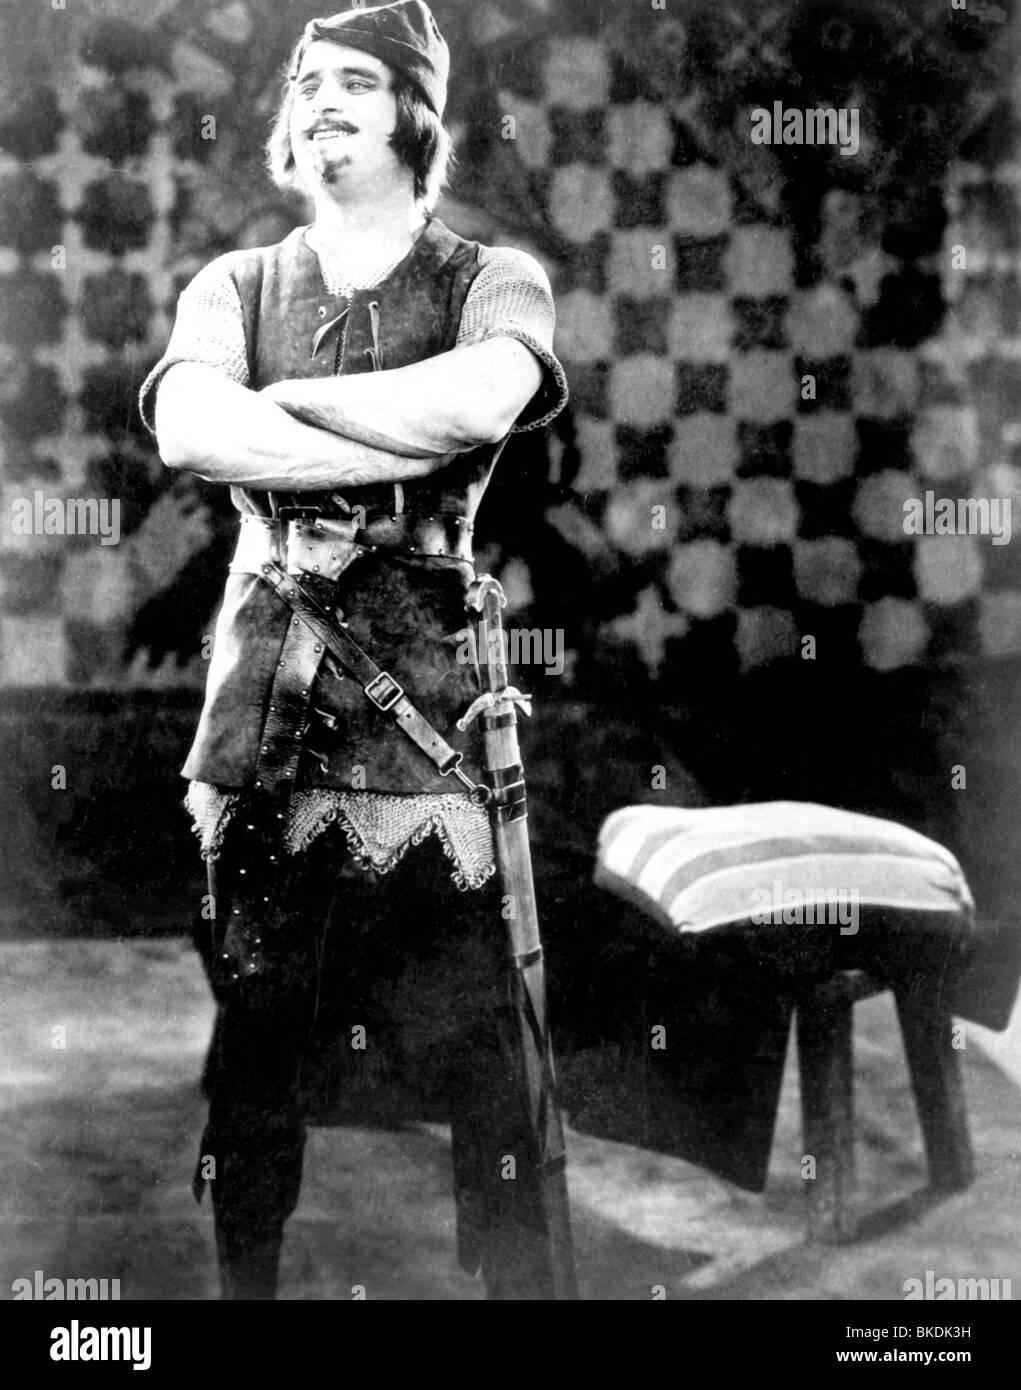 ROBIN HOOD (1922) DOUGLAS FAIRBANKS ROBH 002P - Stock Image